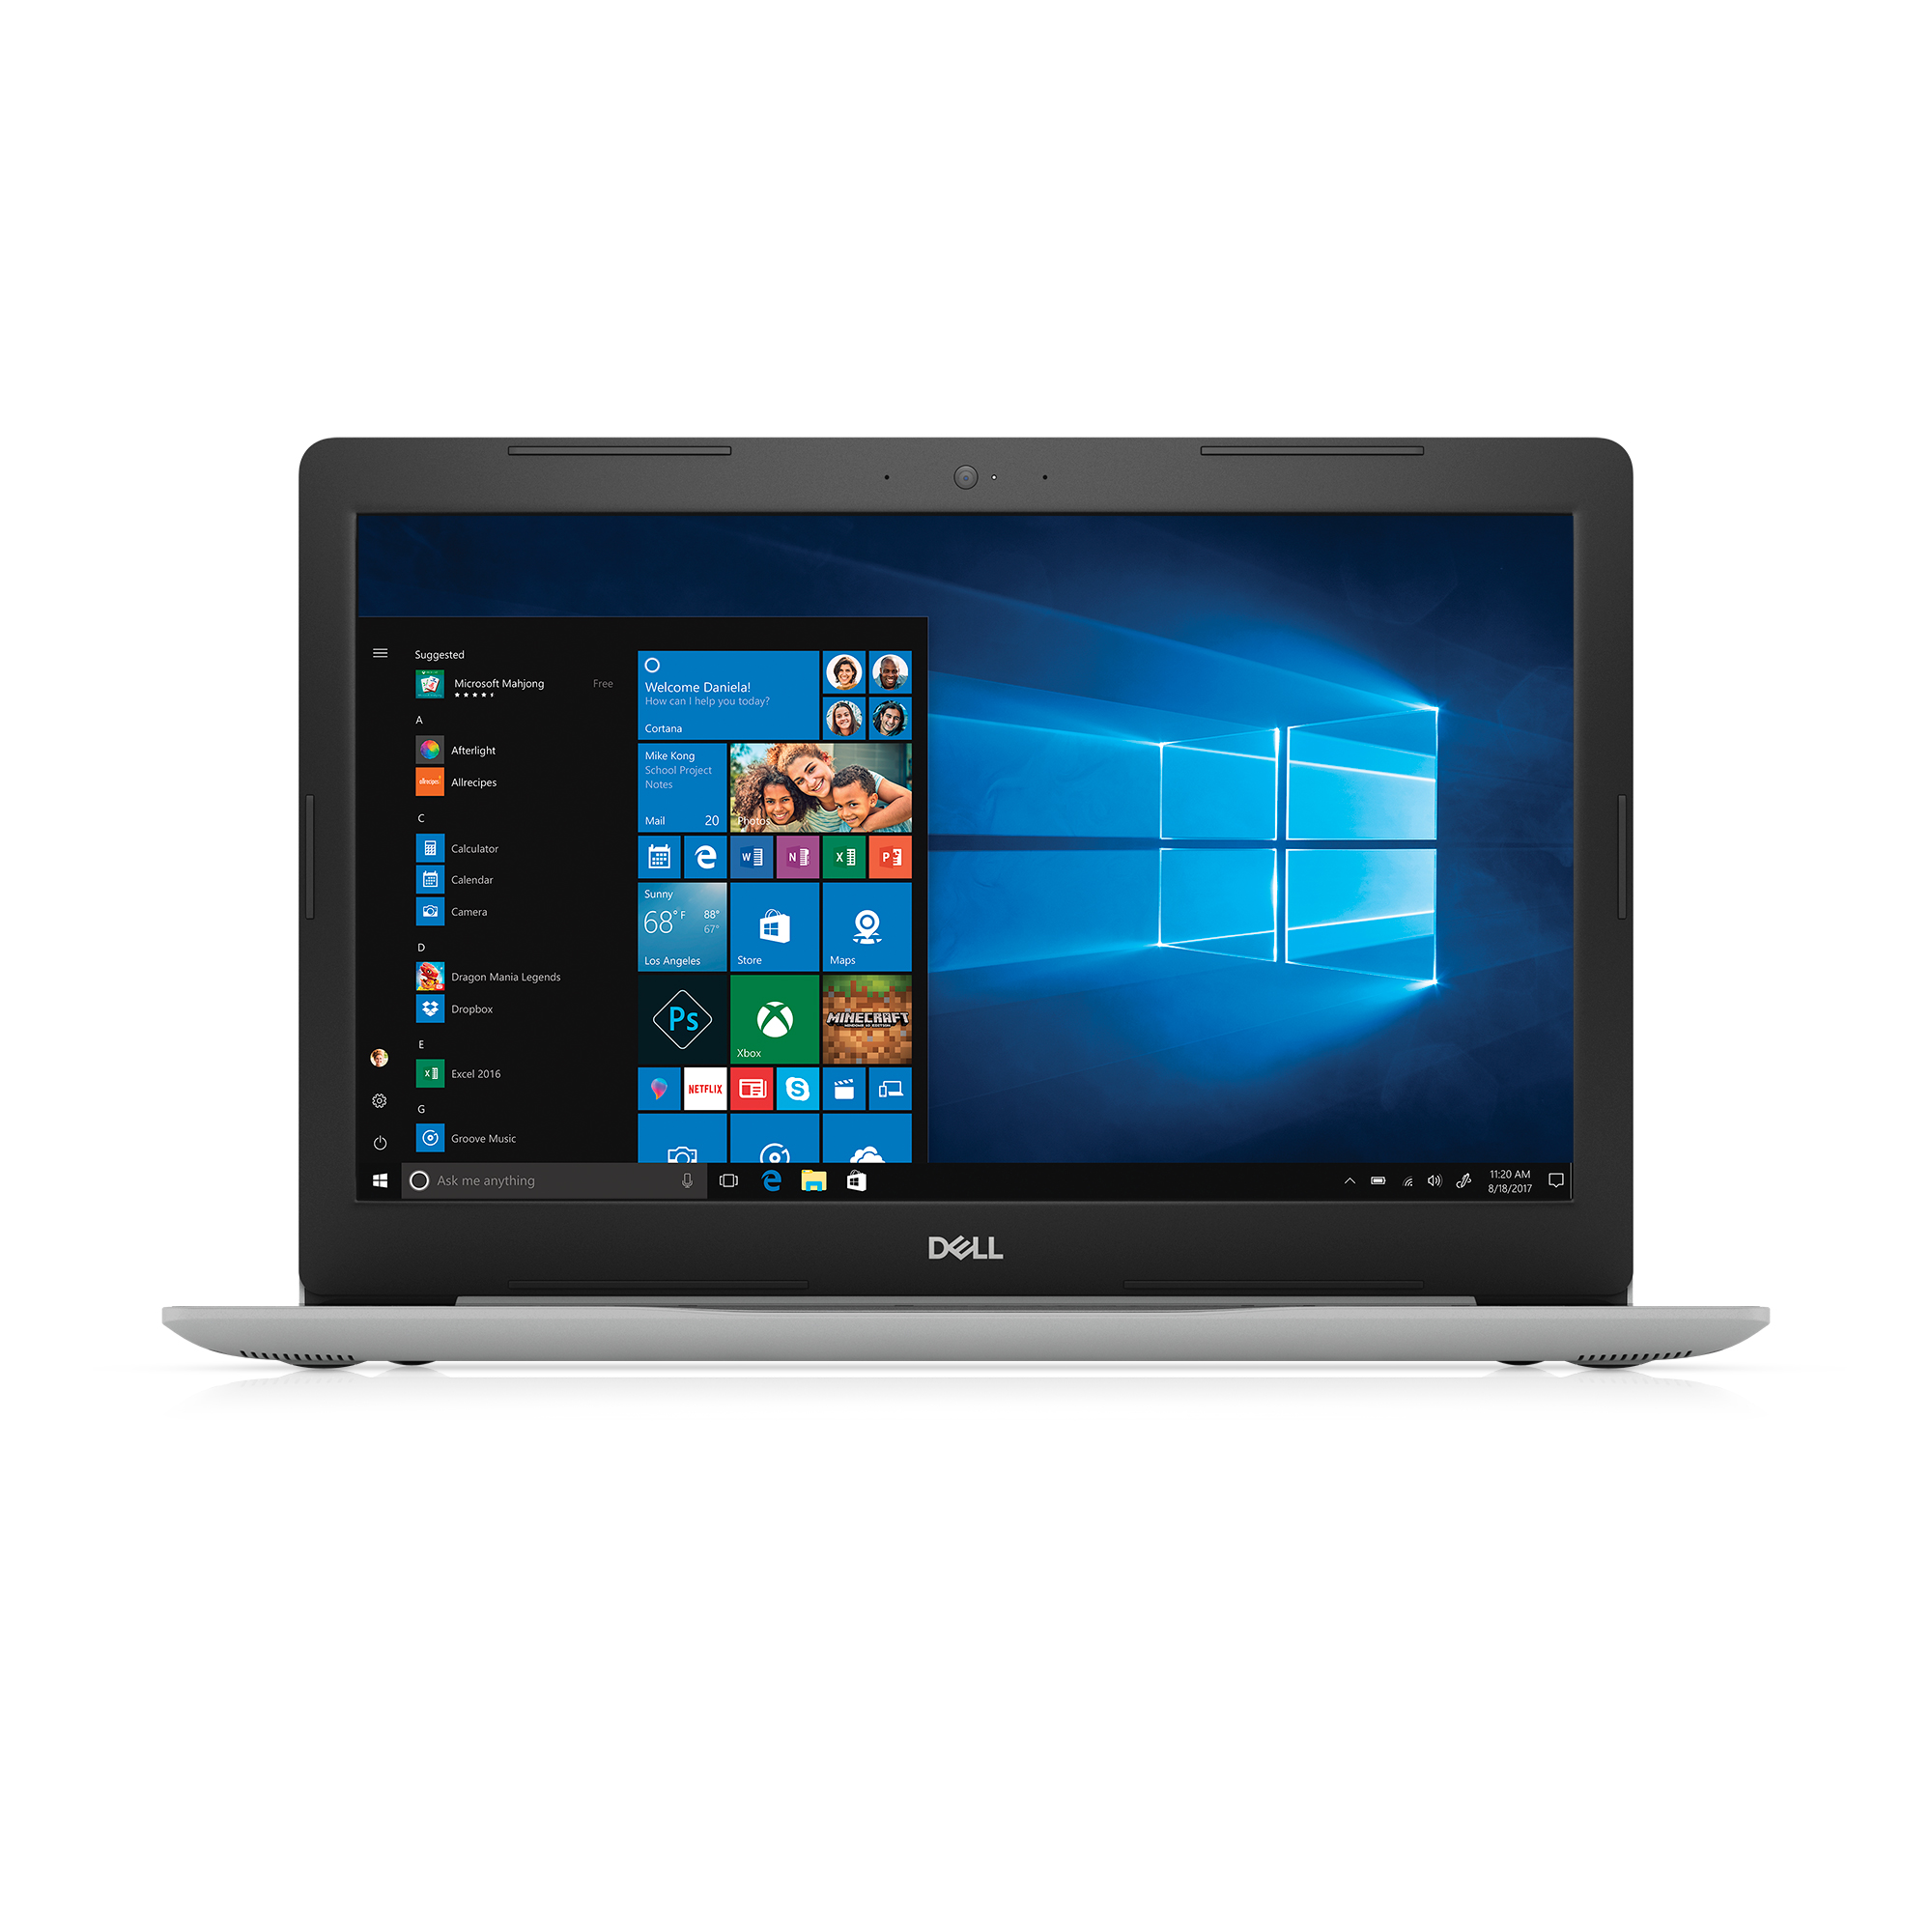 "Dell Inspiron 15 5000 Series Laptop, 15.6"" HD, Intel Core i7, 20GB Total Memory (4GB DRAM + 16GB Intel... by Dell"